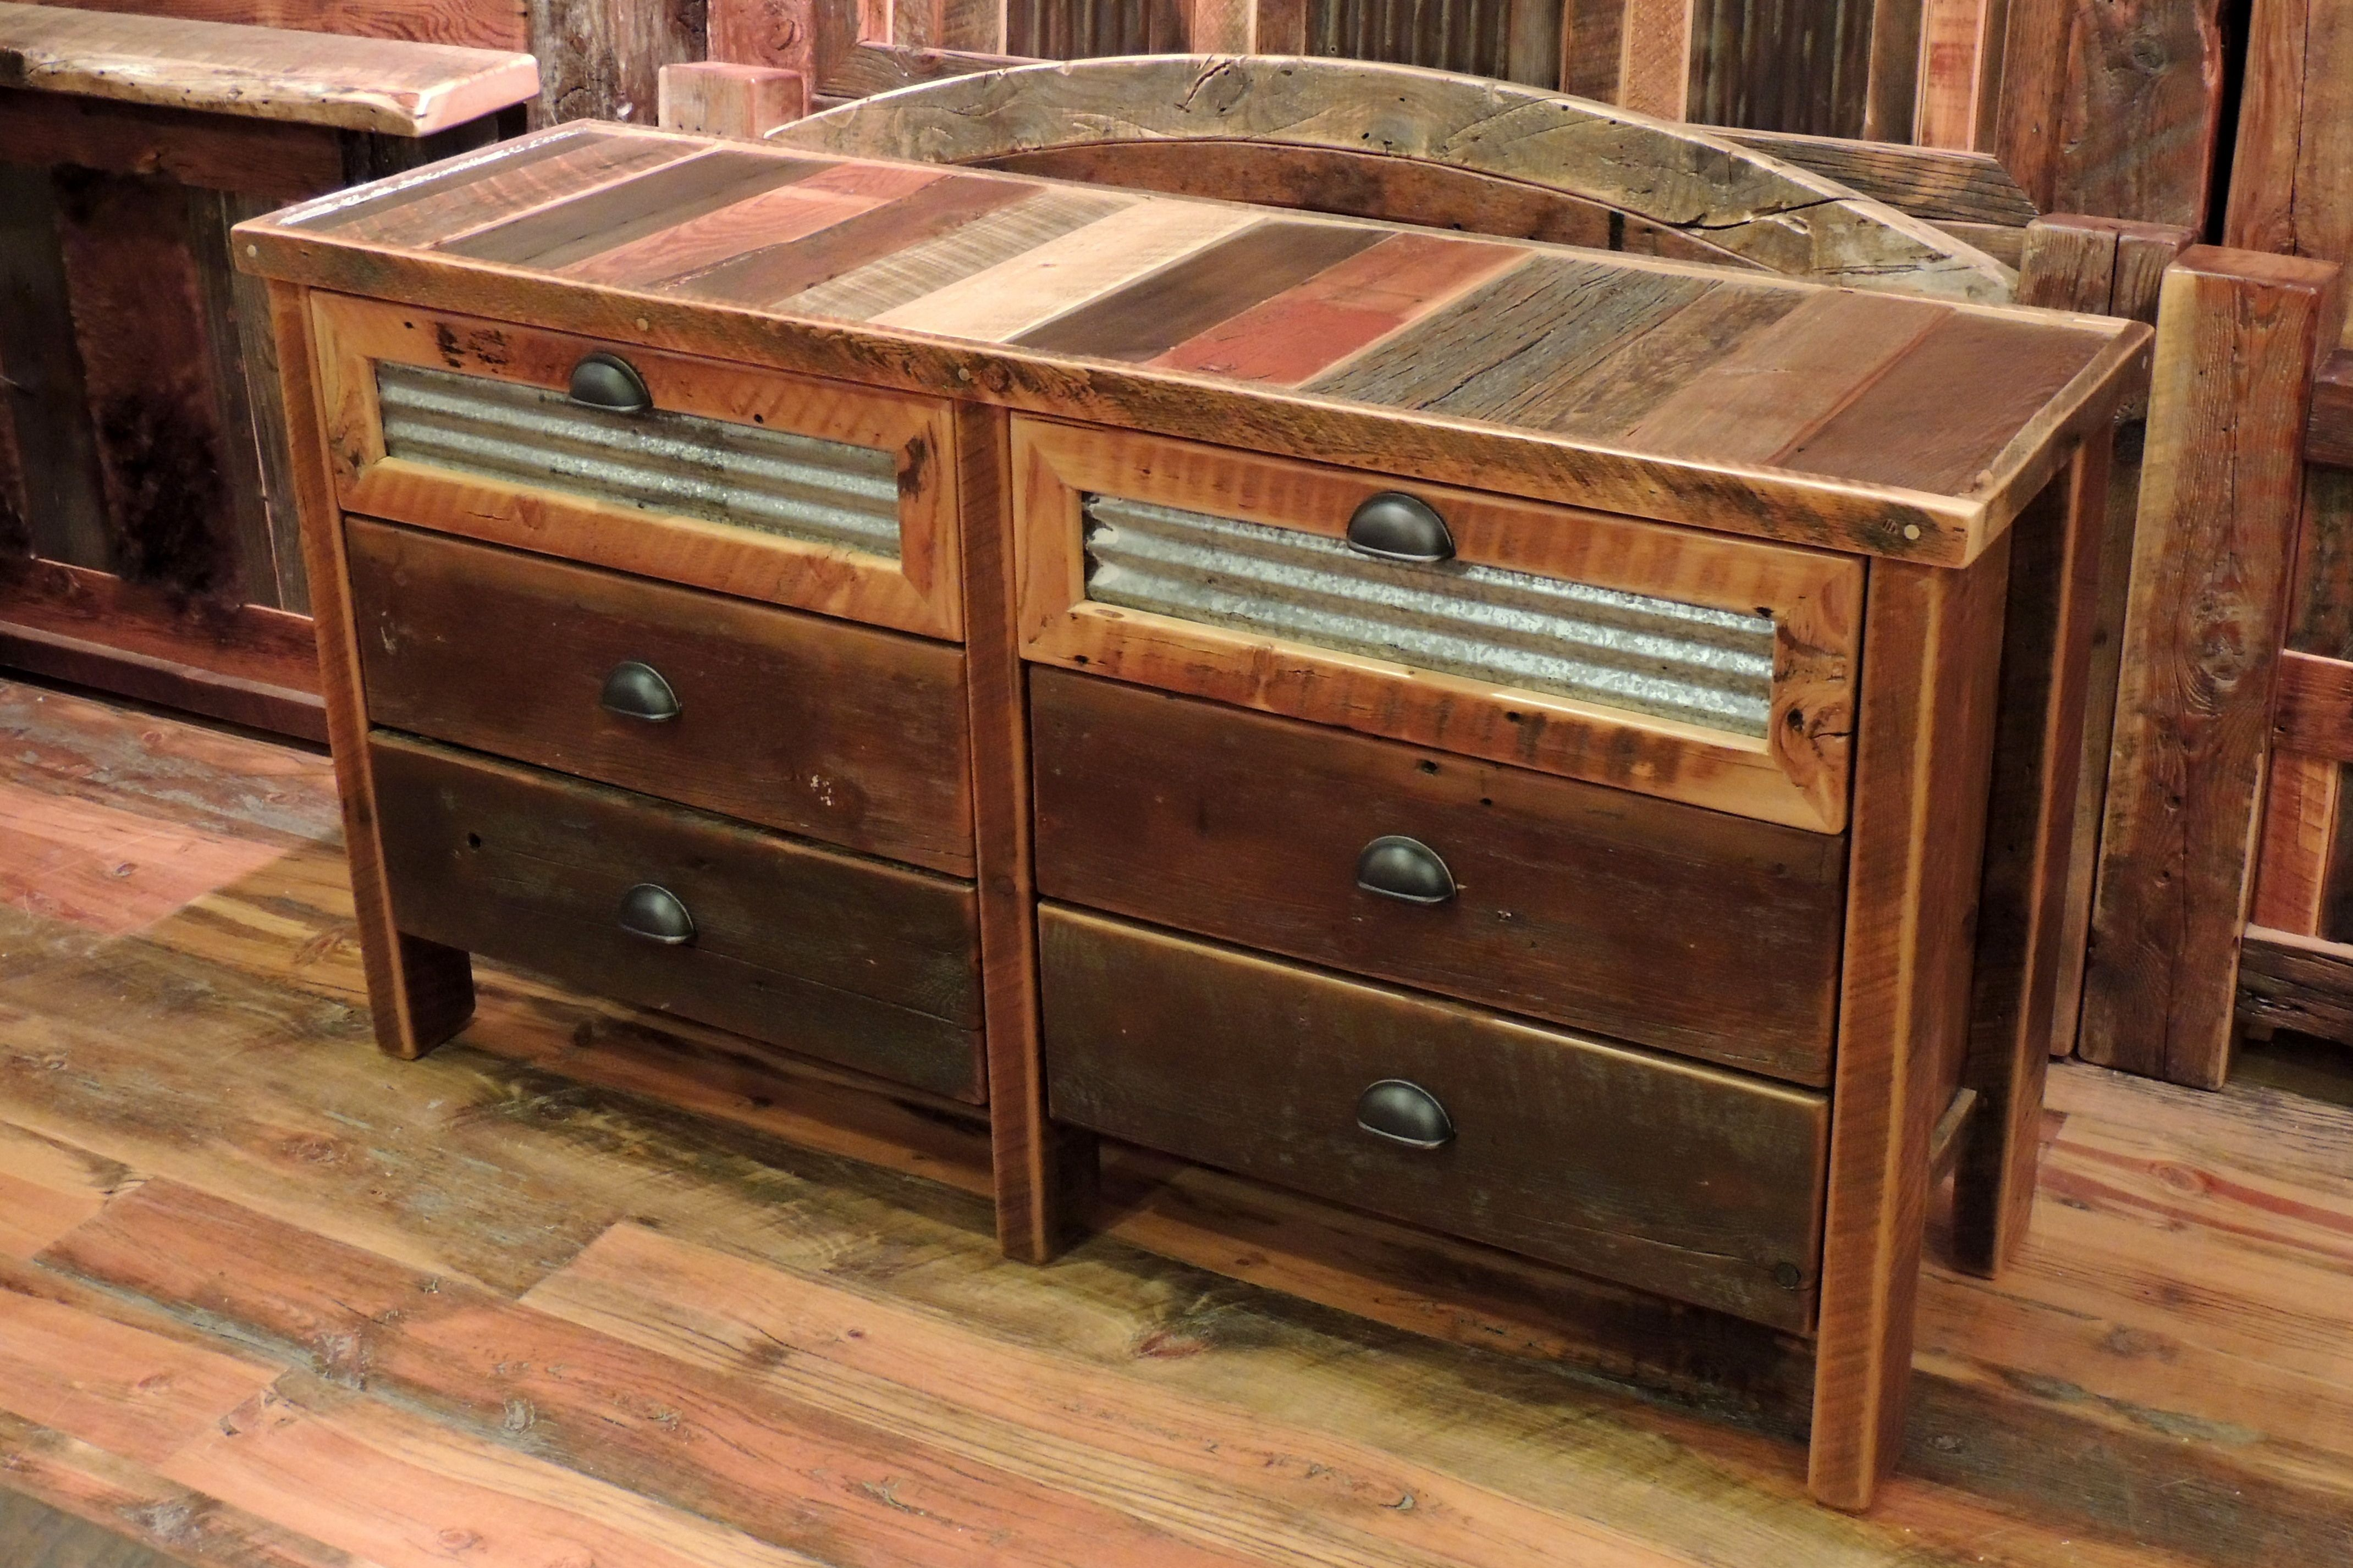 Barn Wood 6 Drawer Dresser, Corrugated Metal in Top